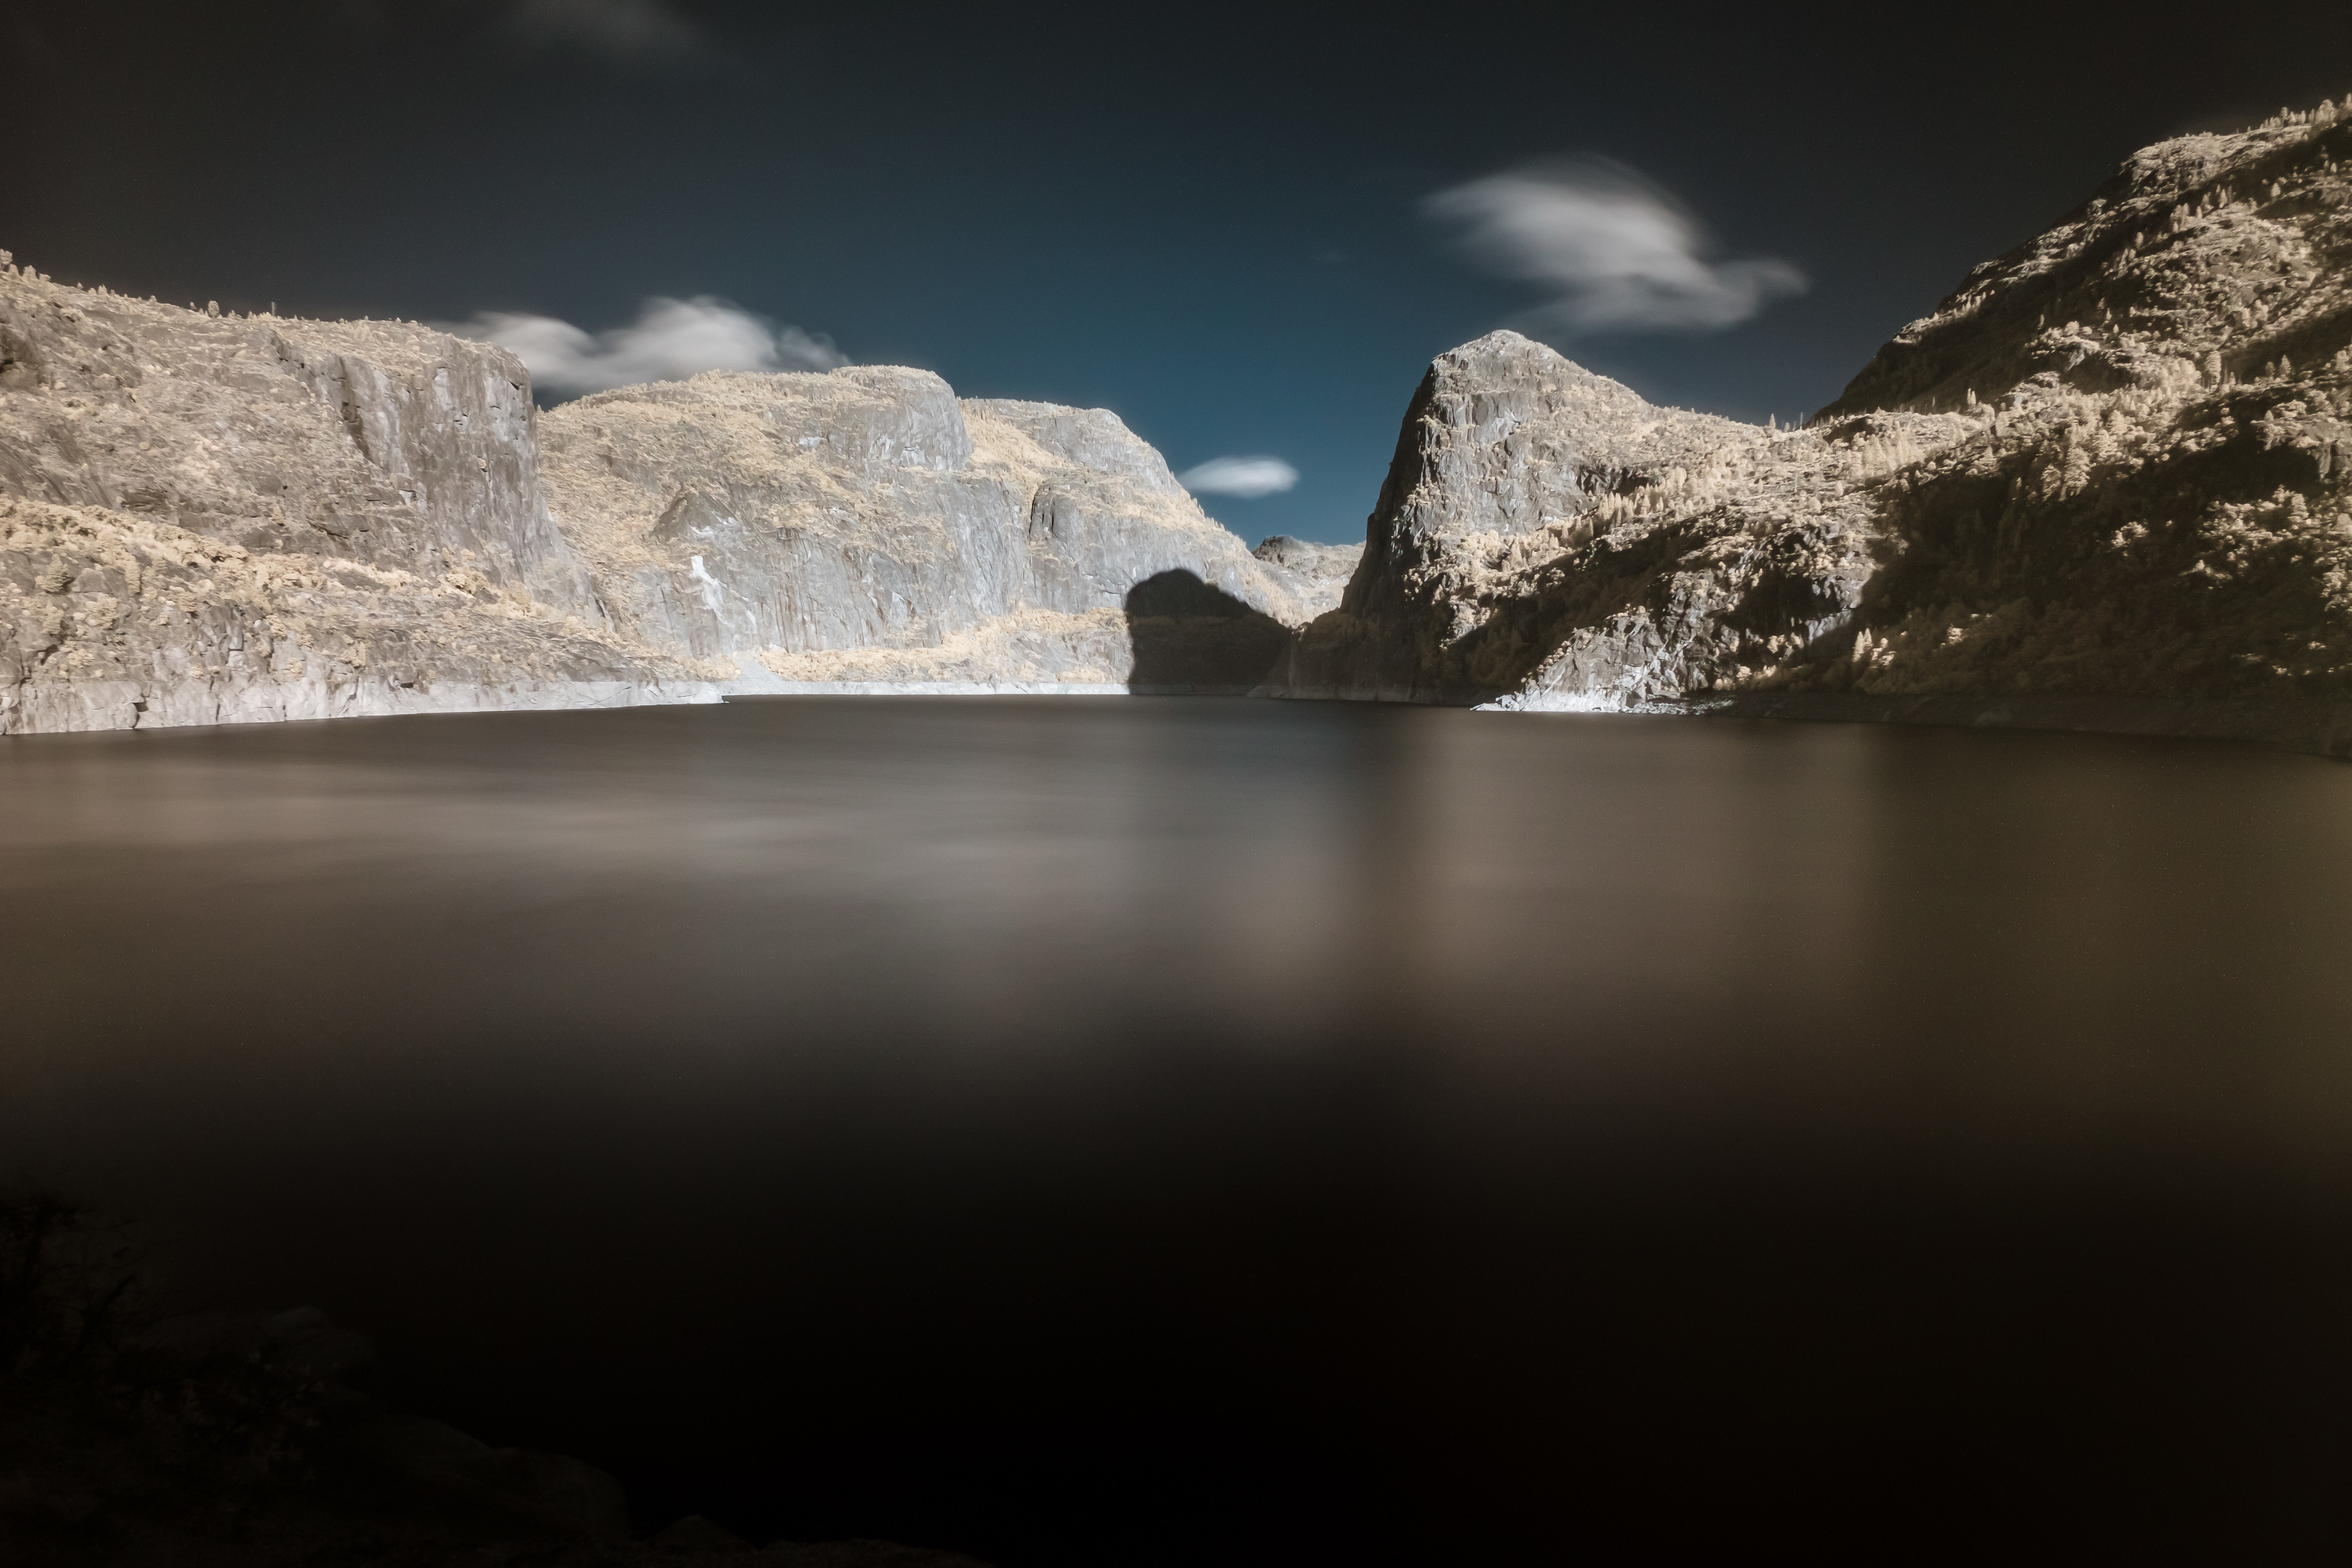 Hetch Hetchy Reservoir, Yosemite National Park